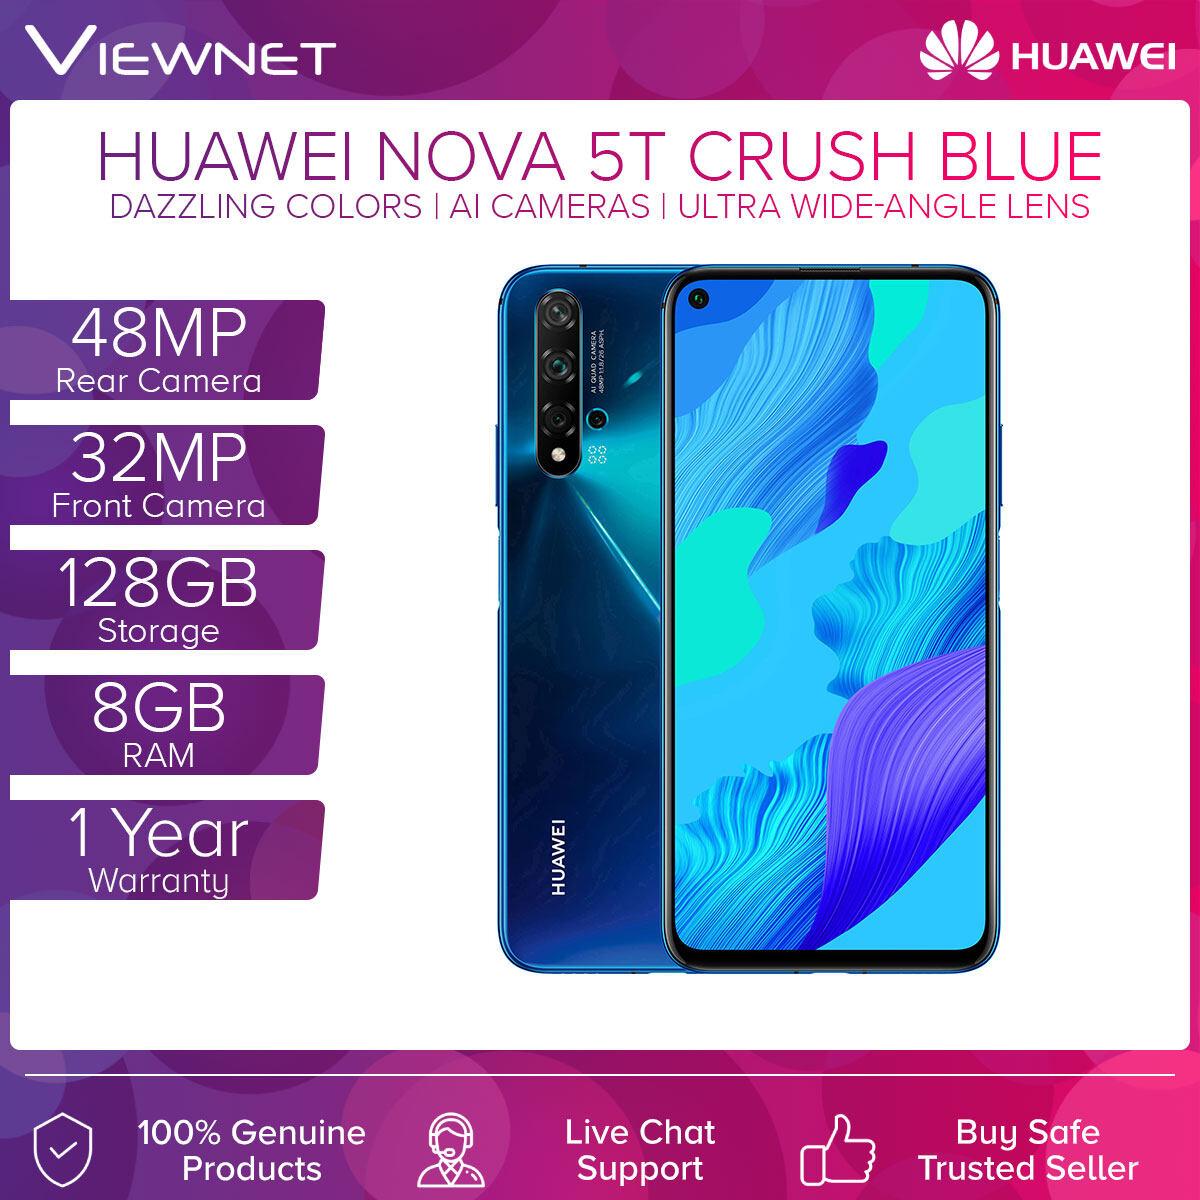 Huawei Nova 5T Smartphone (8GB RAM + 128GB ROM) (Midsummer Purple / Crush Blue / Black)